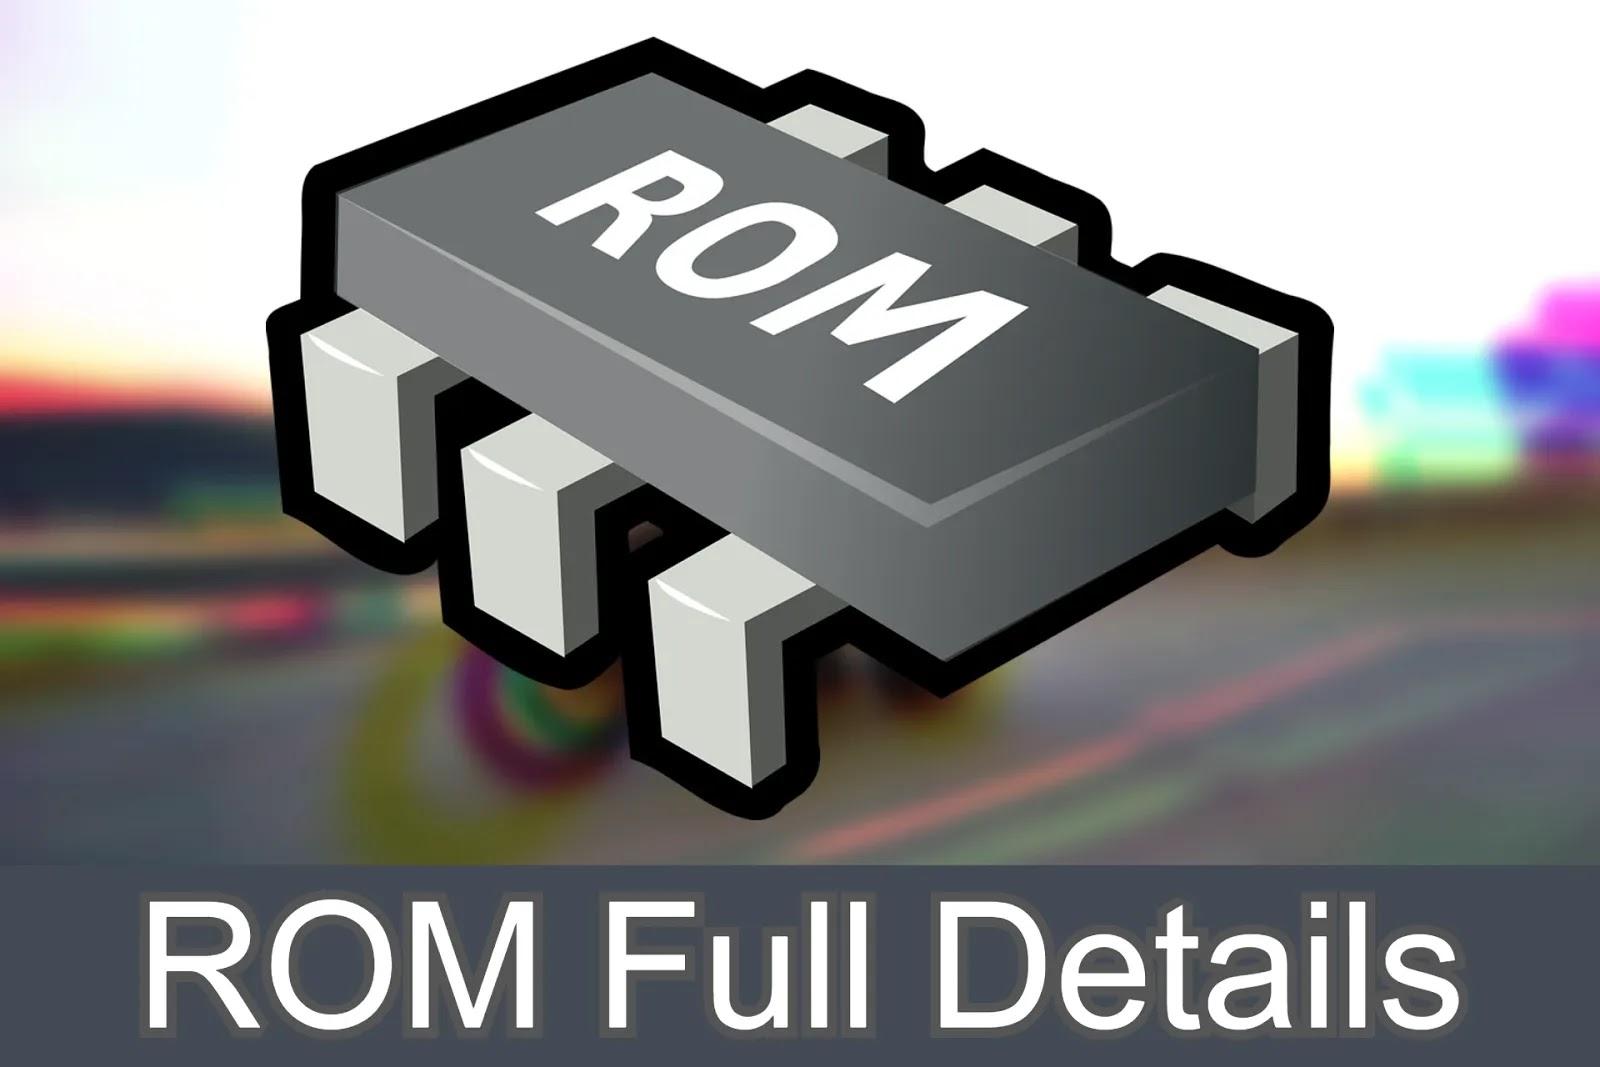 Read-Only Memory (ROM) Full Details 2020